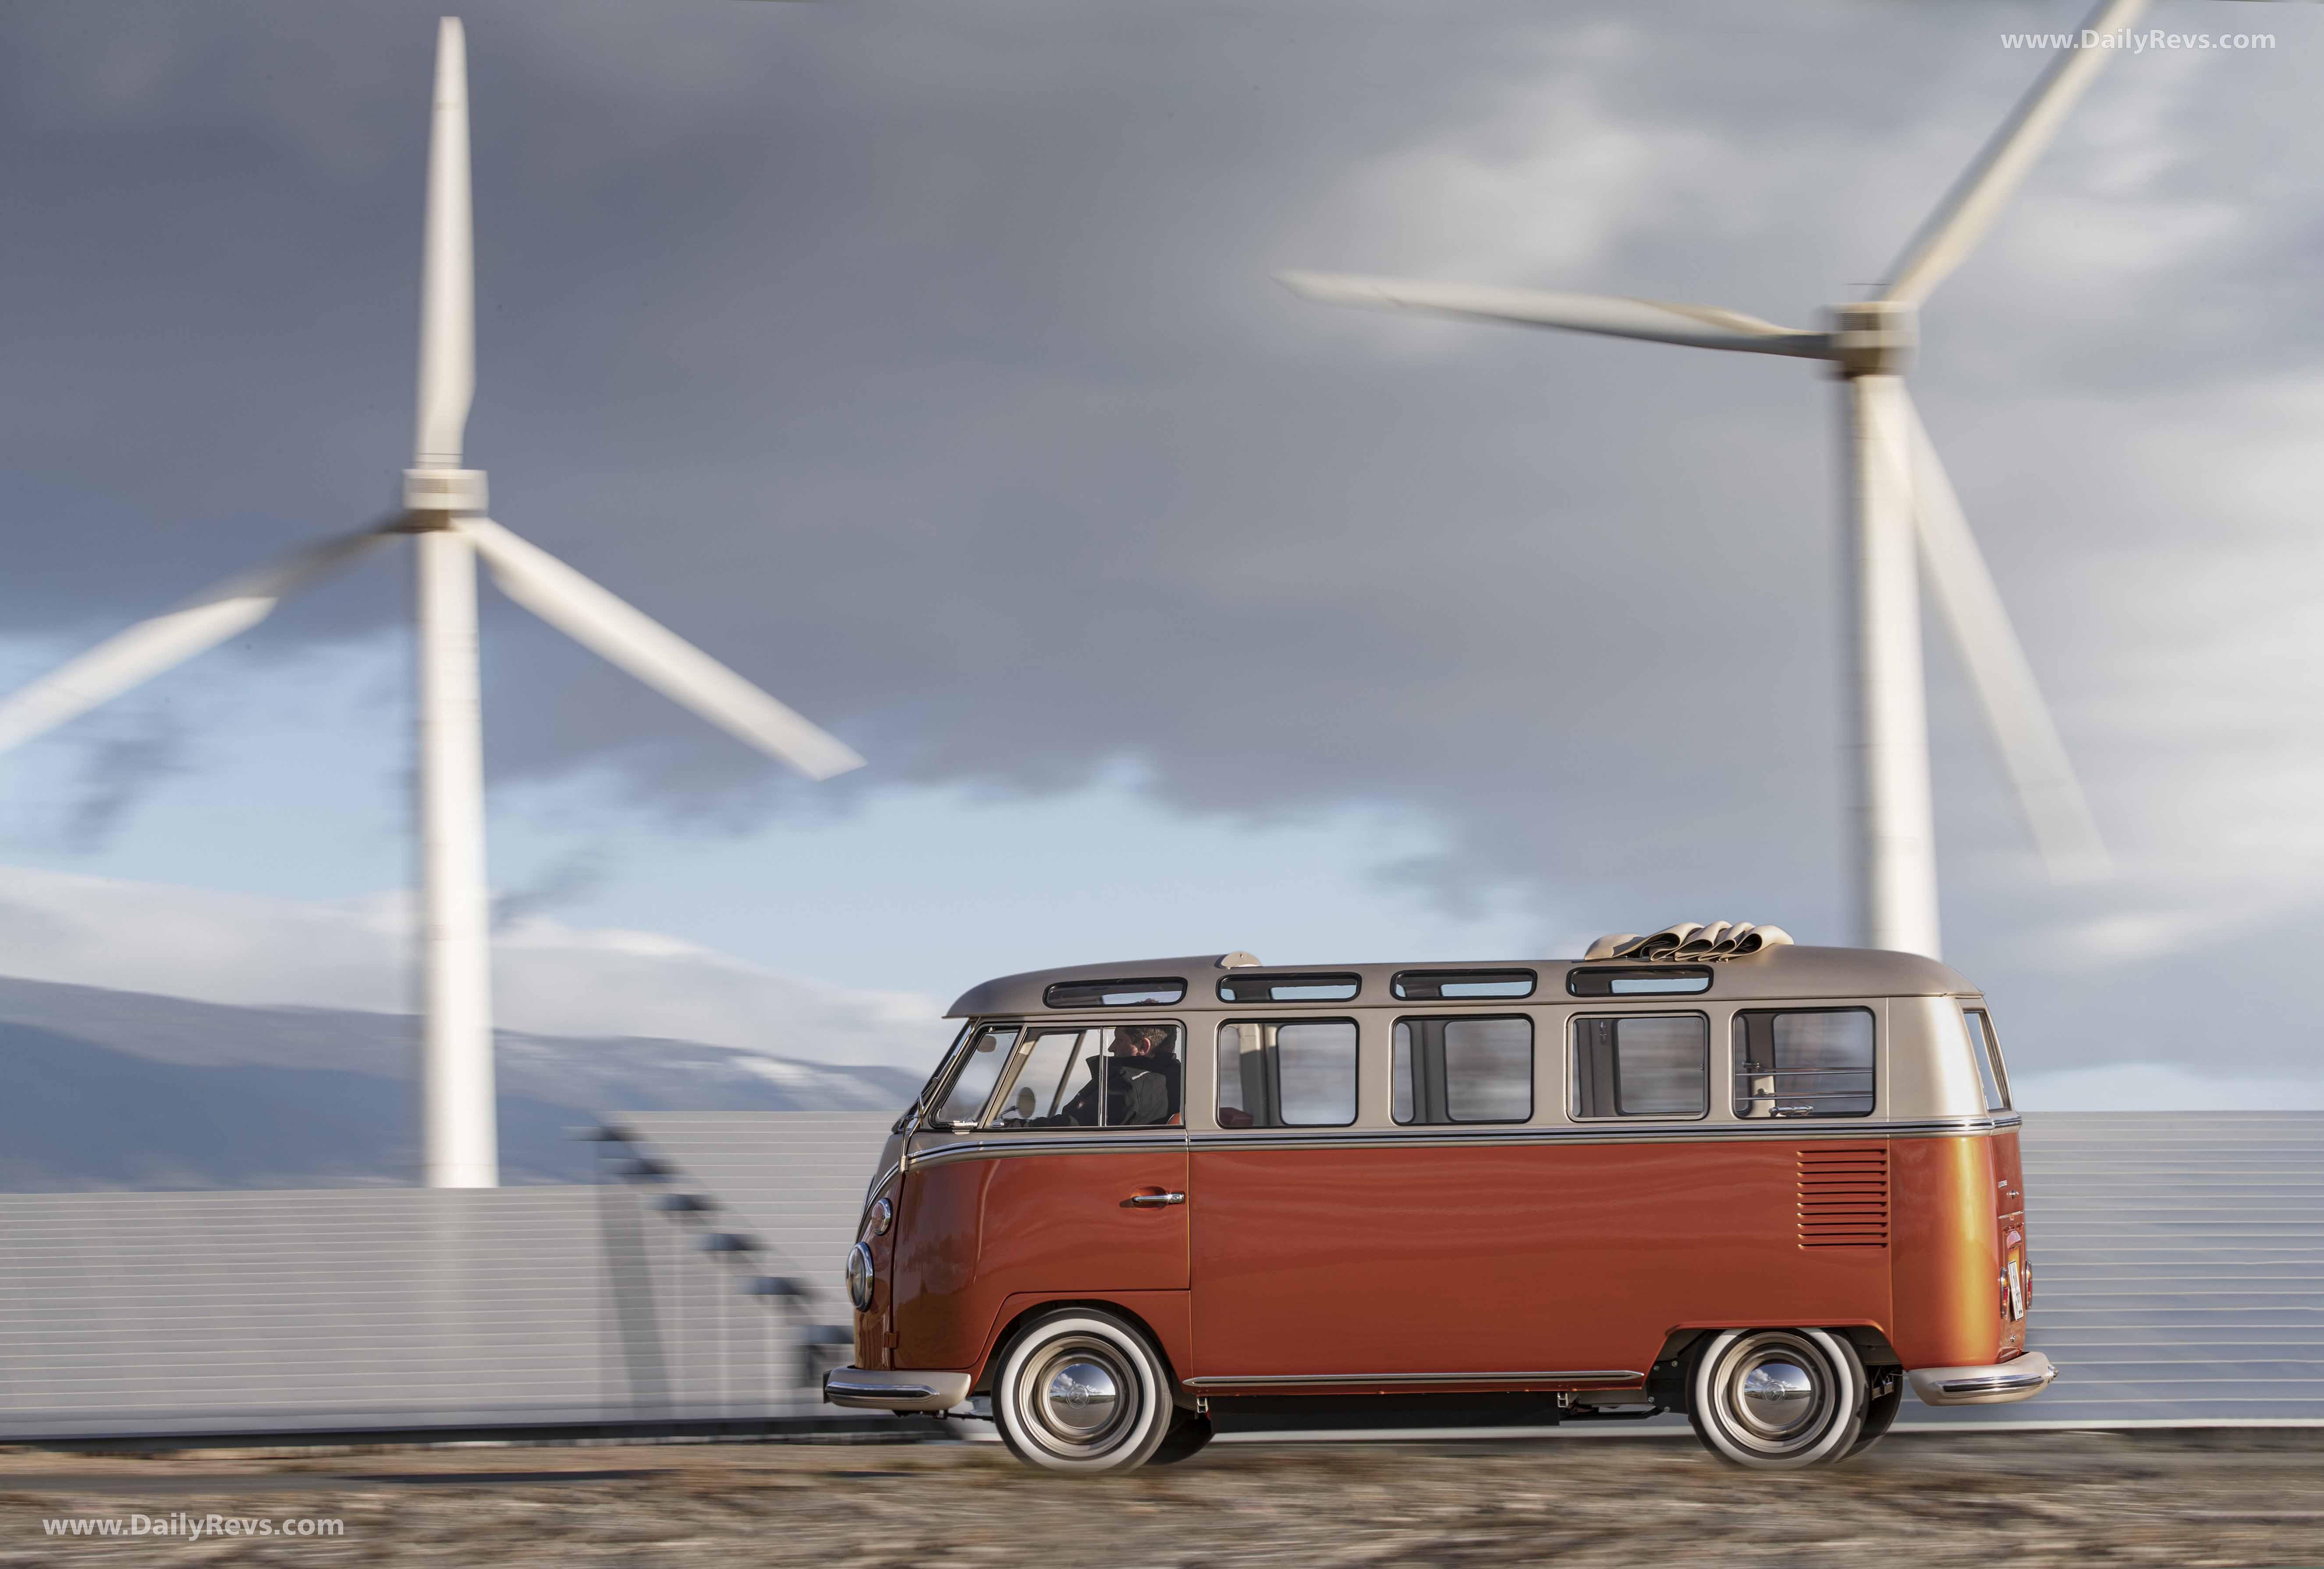 2020 Volkswagen e-Bulli Concept - Dailyrevs